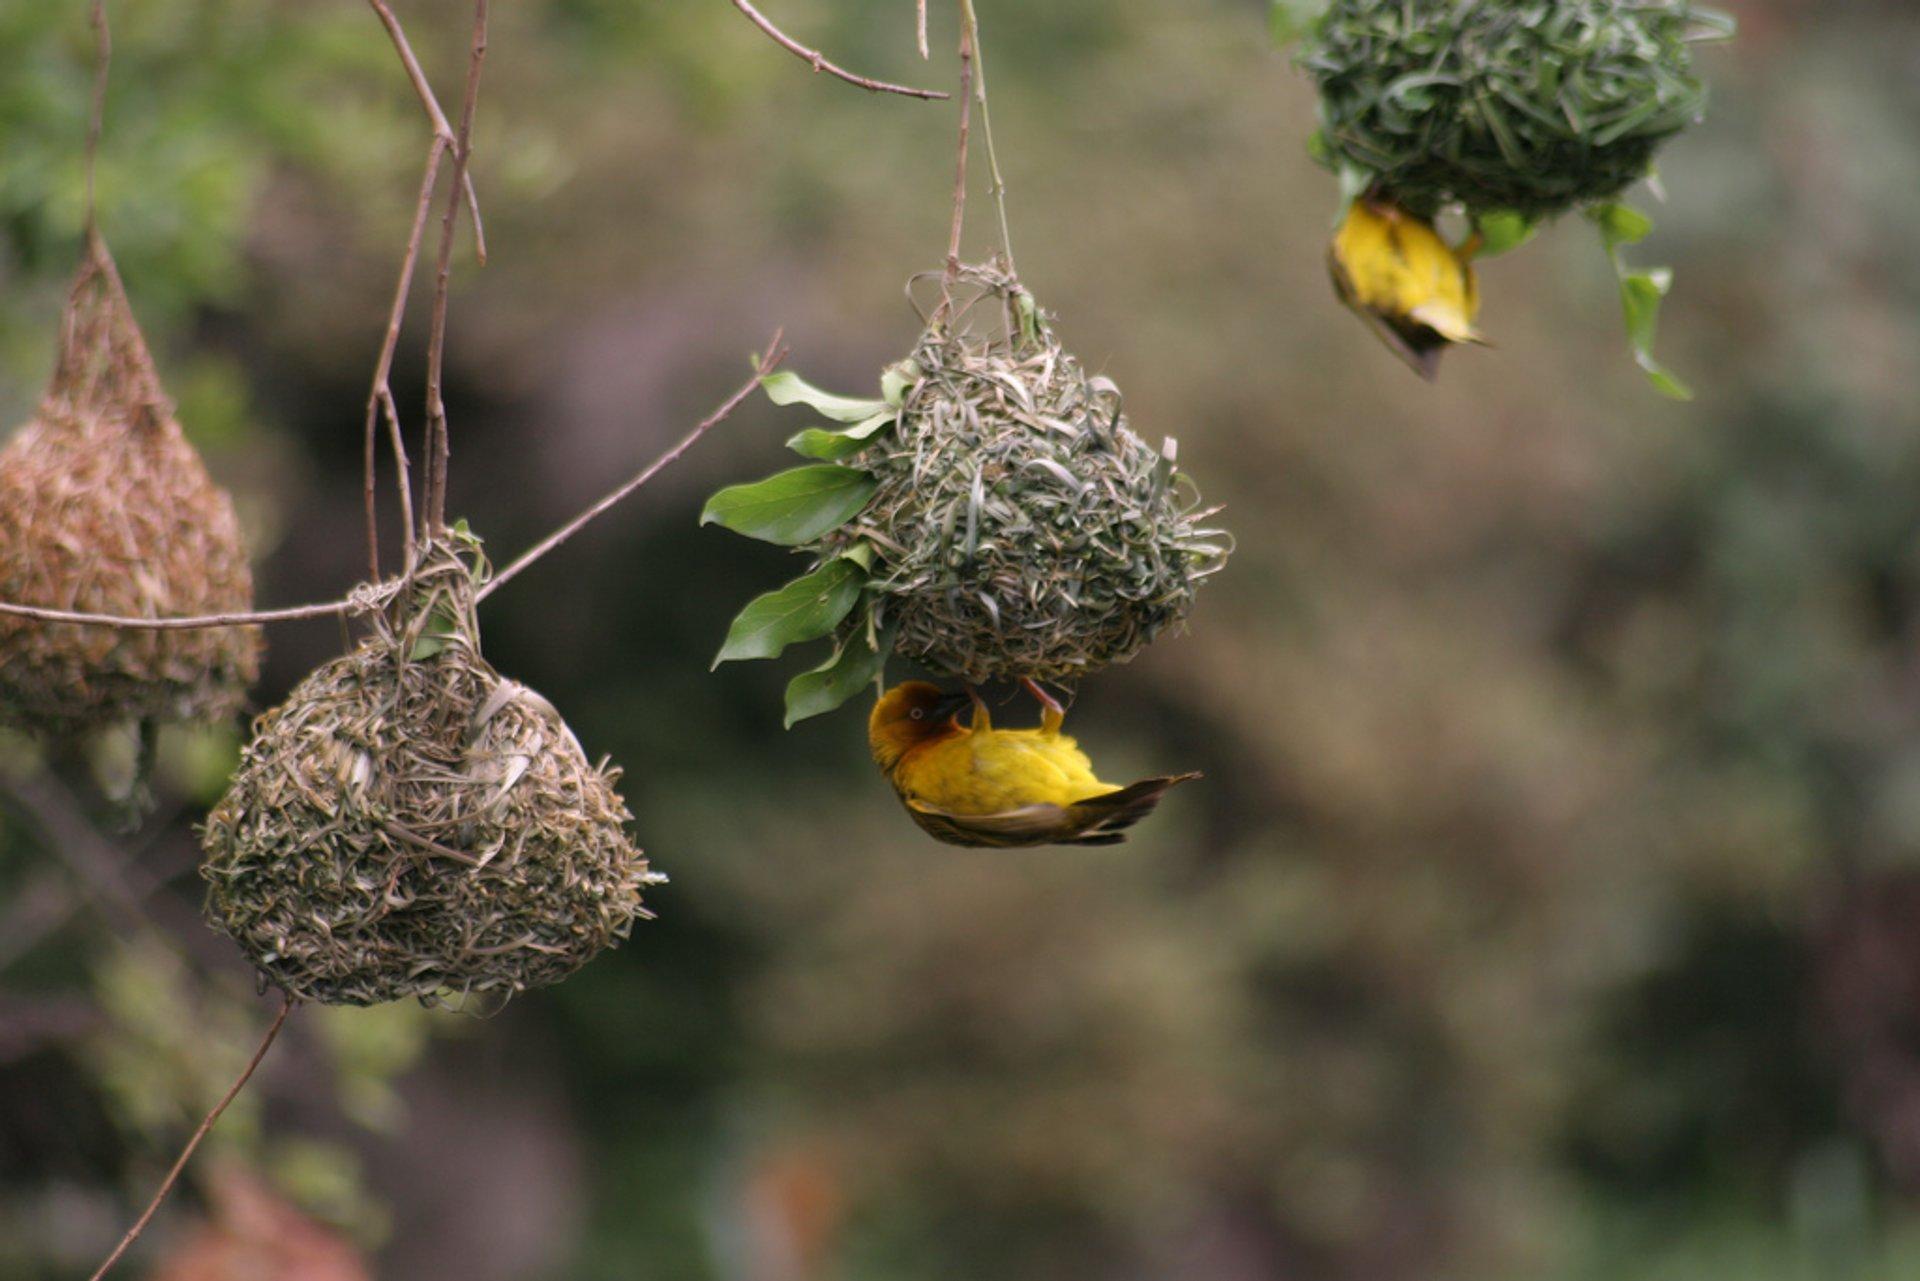 Cape weaver in breeding plumage 2020